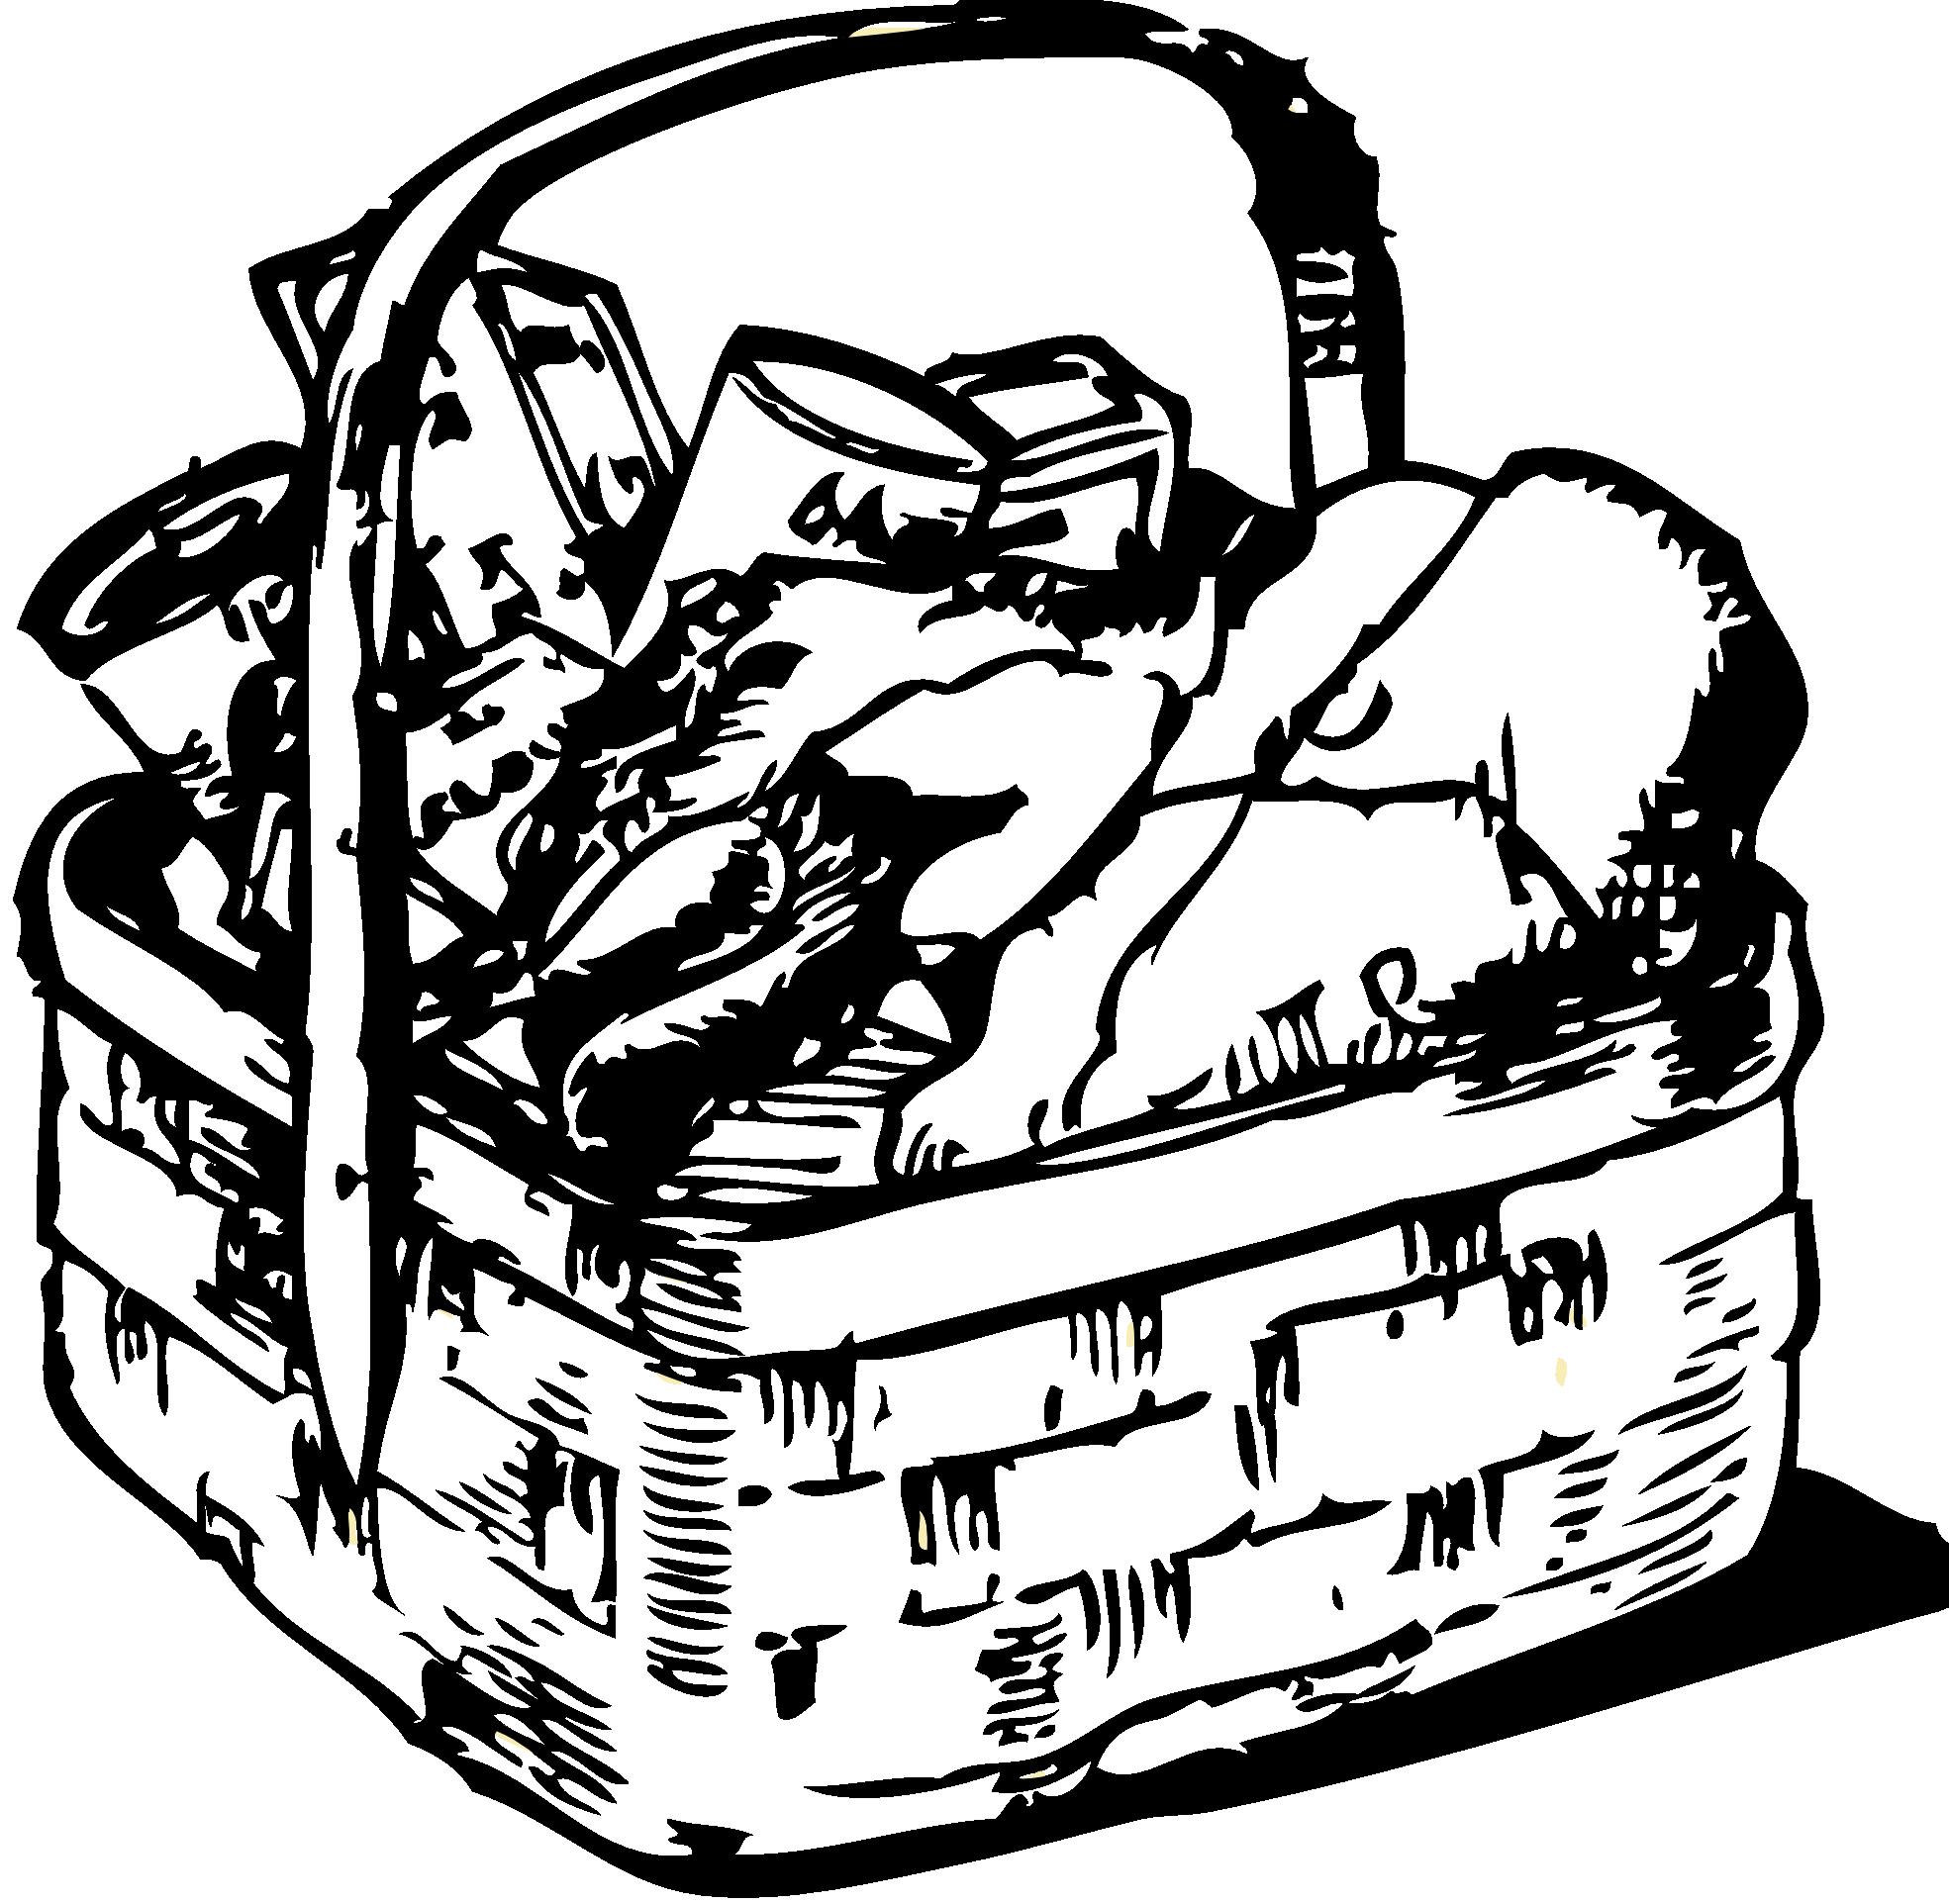 Raffle clipart hampers. Picnic basket black and